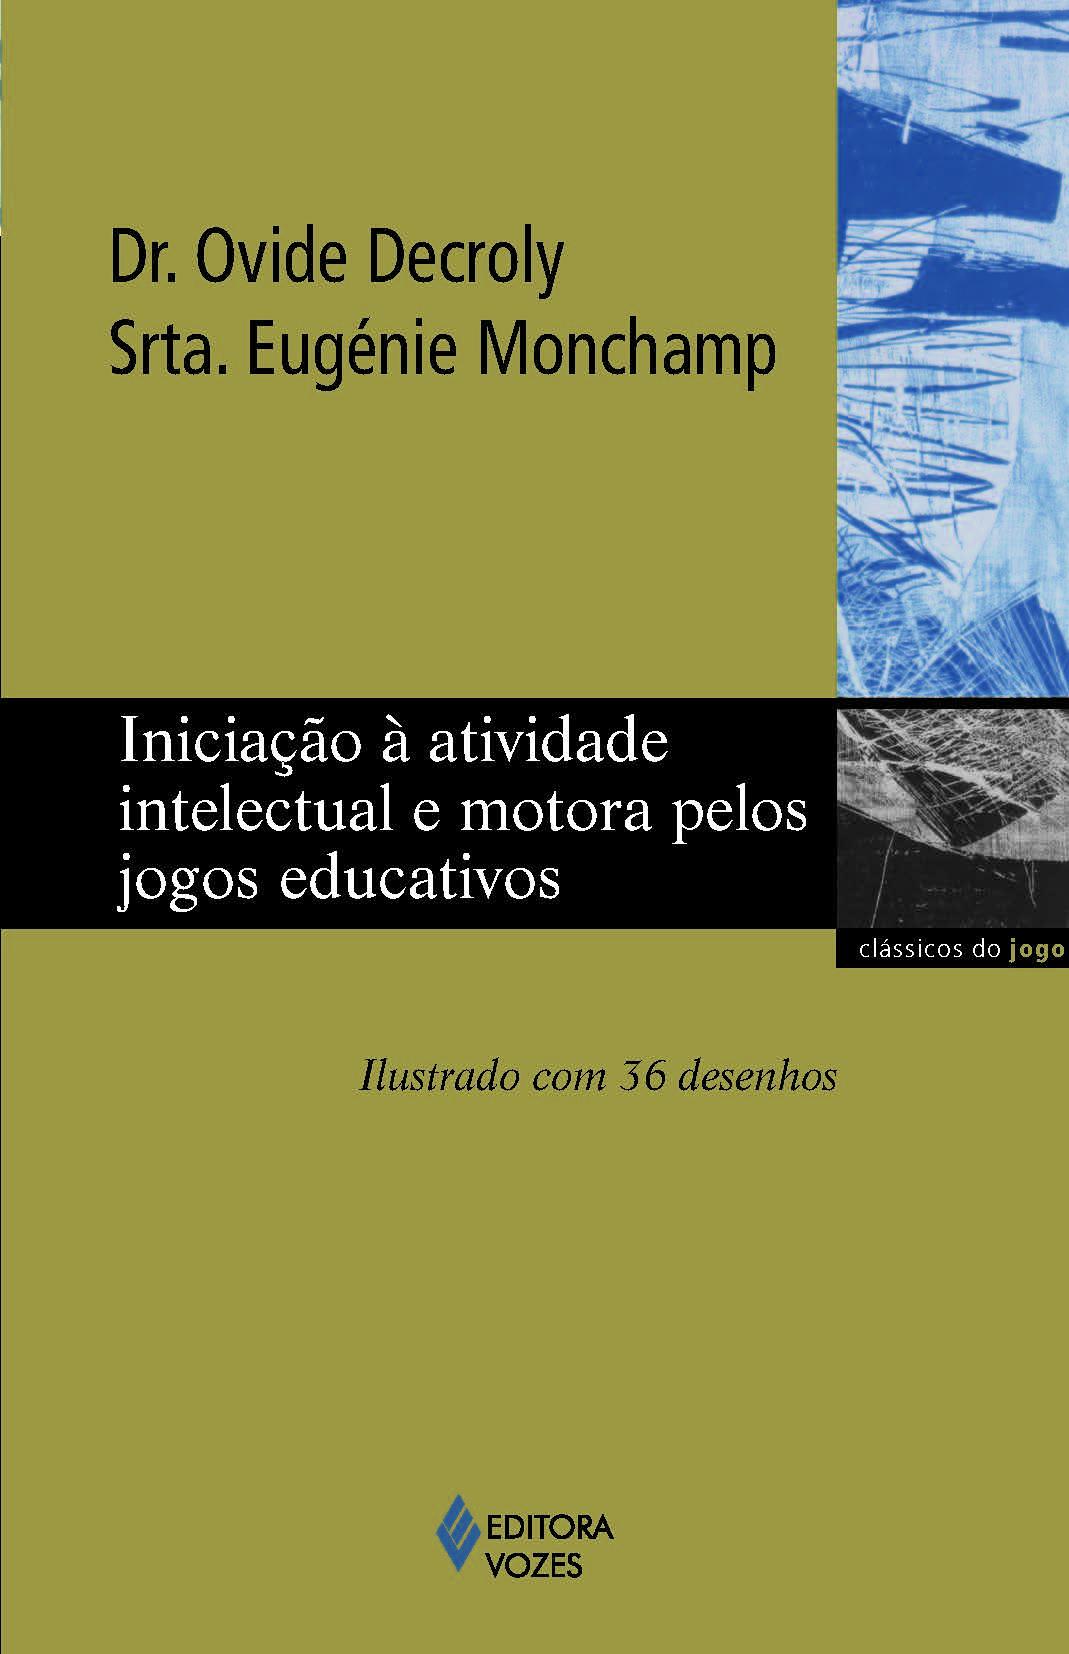 INICIACAO A ATIVIDADE INTELECTUAL E MOTORA PELOS JOGOS EDUCATIVOS - ILUSTRA